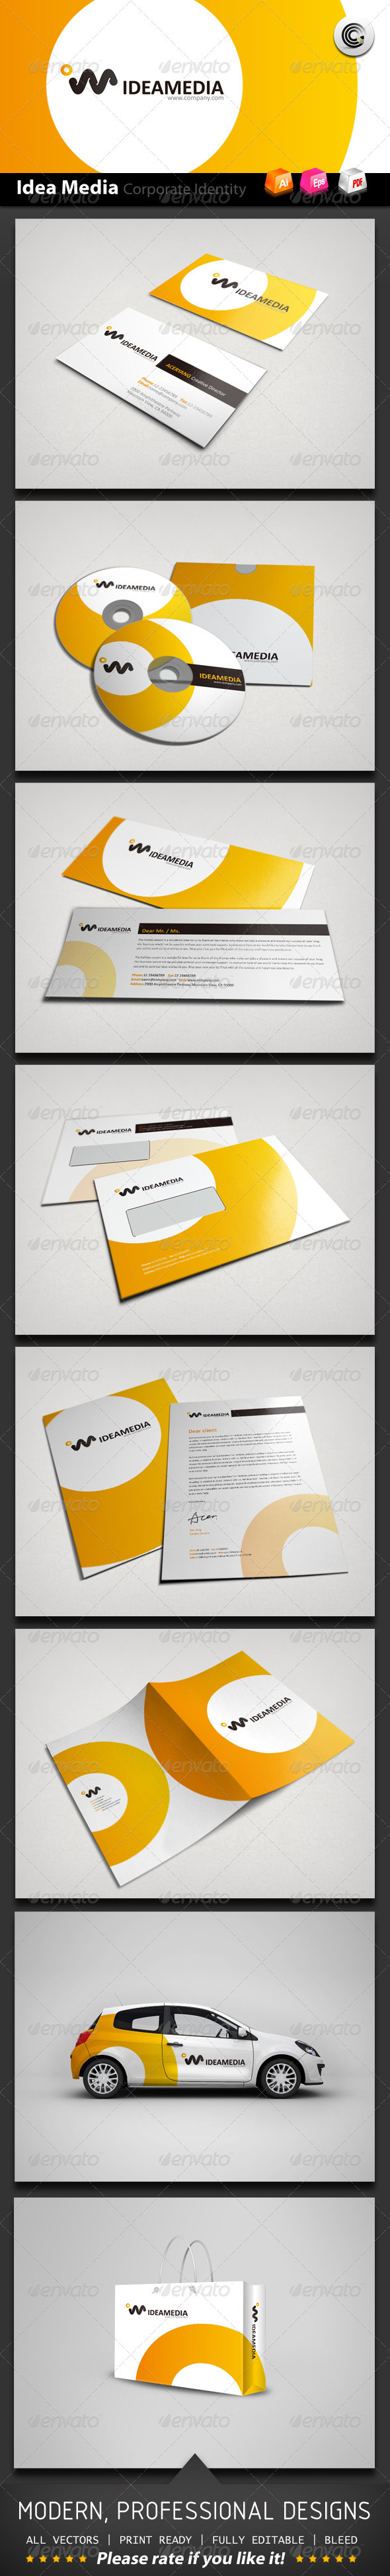 Idea Media Corporate Identity - Stationery Print Templates